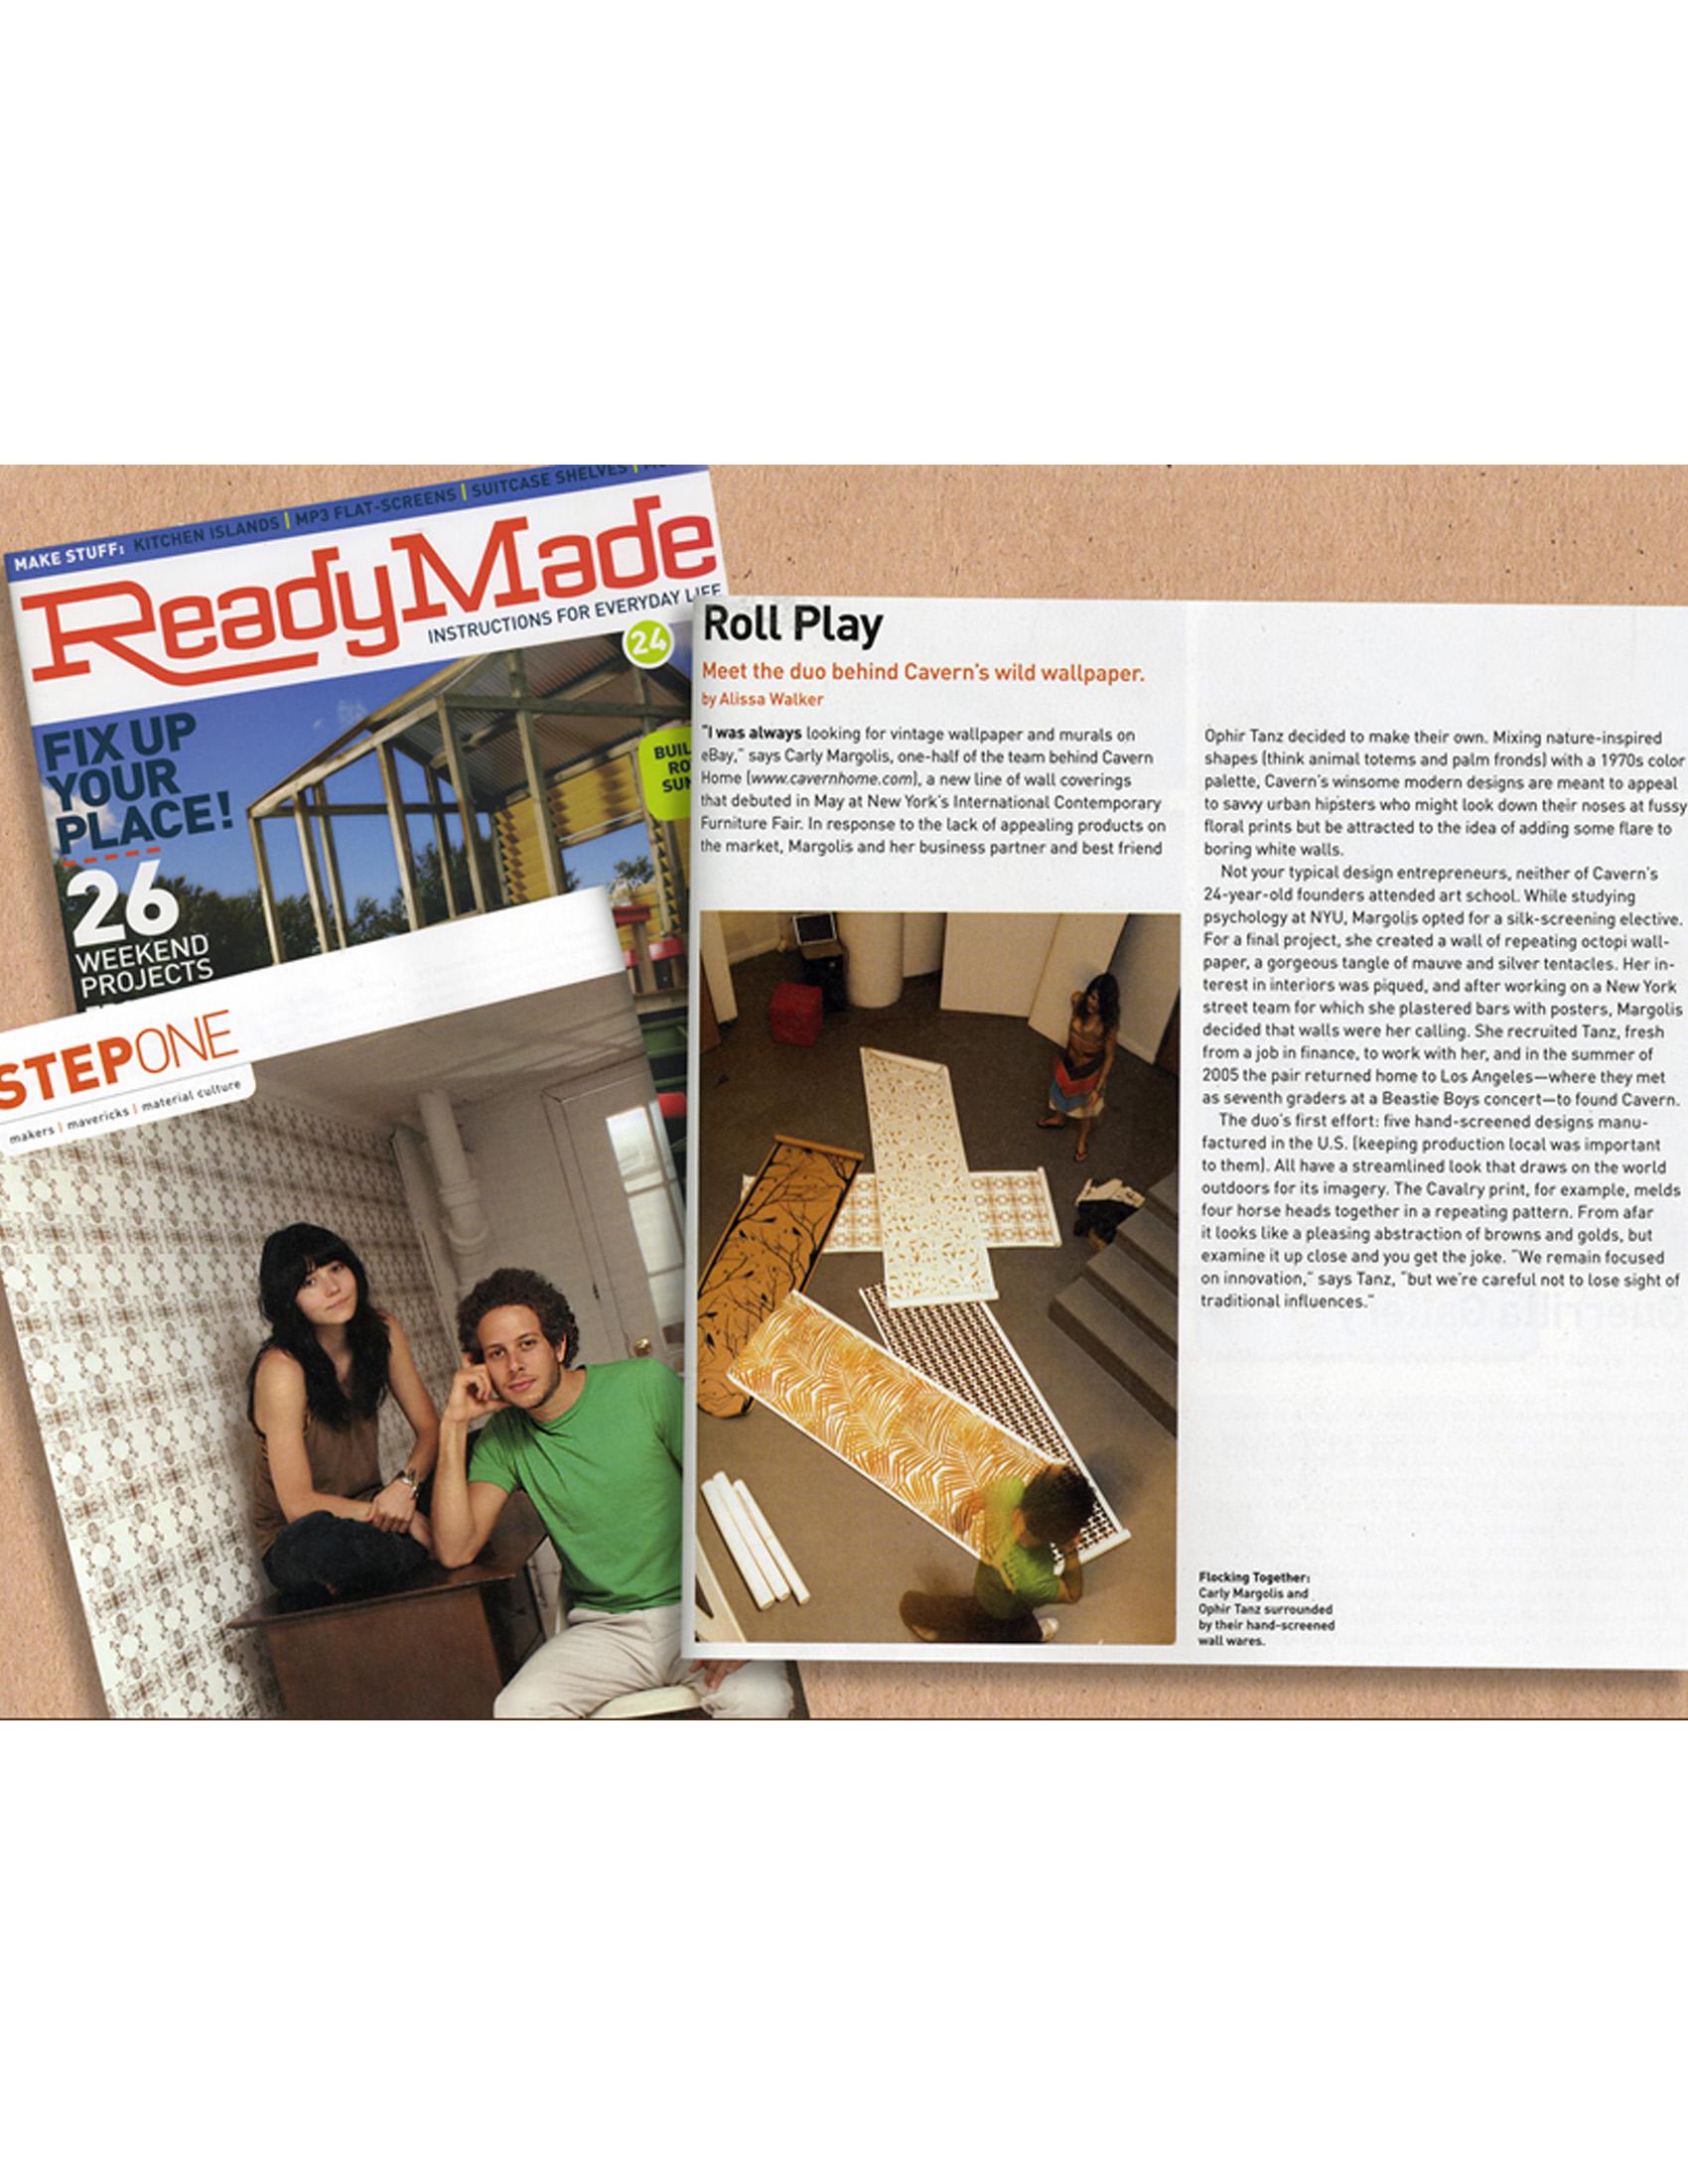 ReadyMade Magazine August 2006